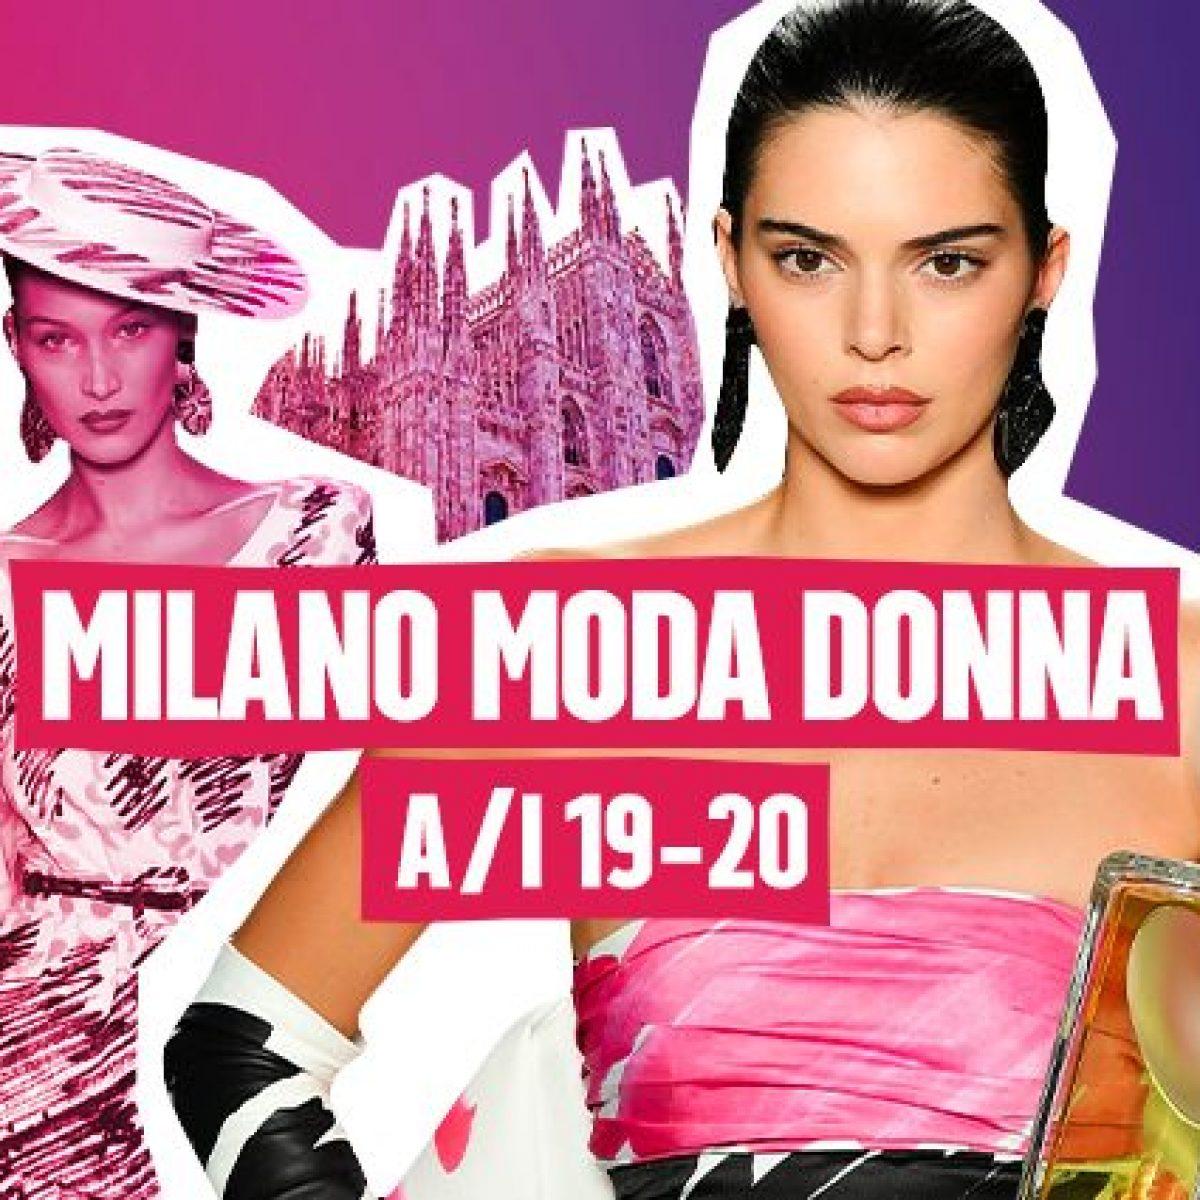 Calendario Moda Milano 2020.Milano Fashion Week A I 19 20 Il Calendario Delle Sfilate E